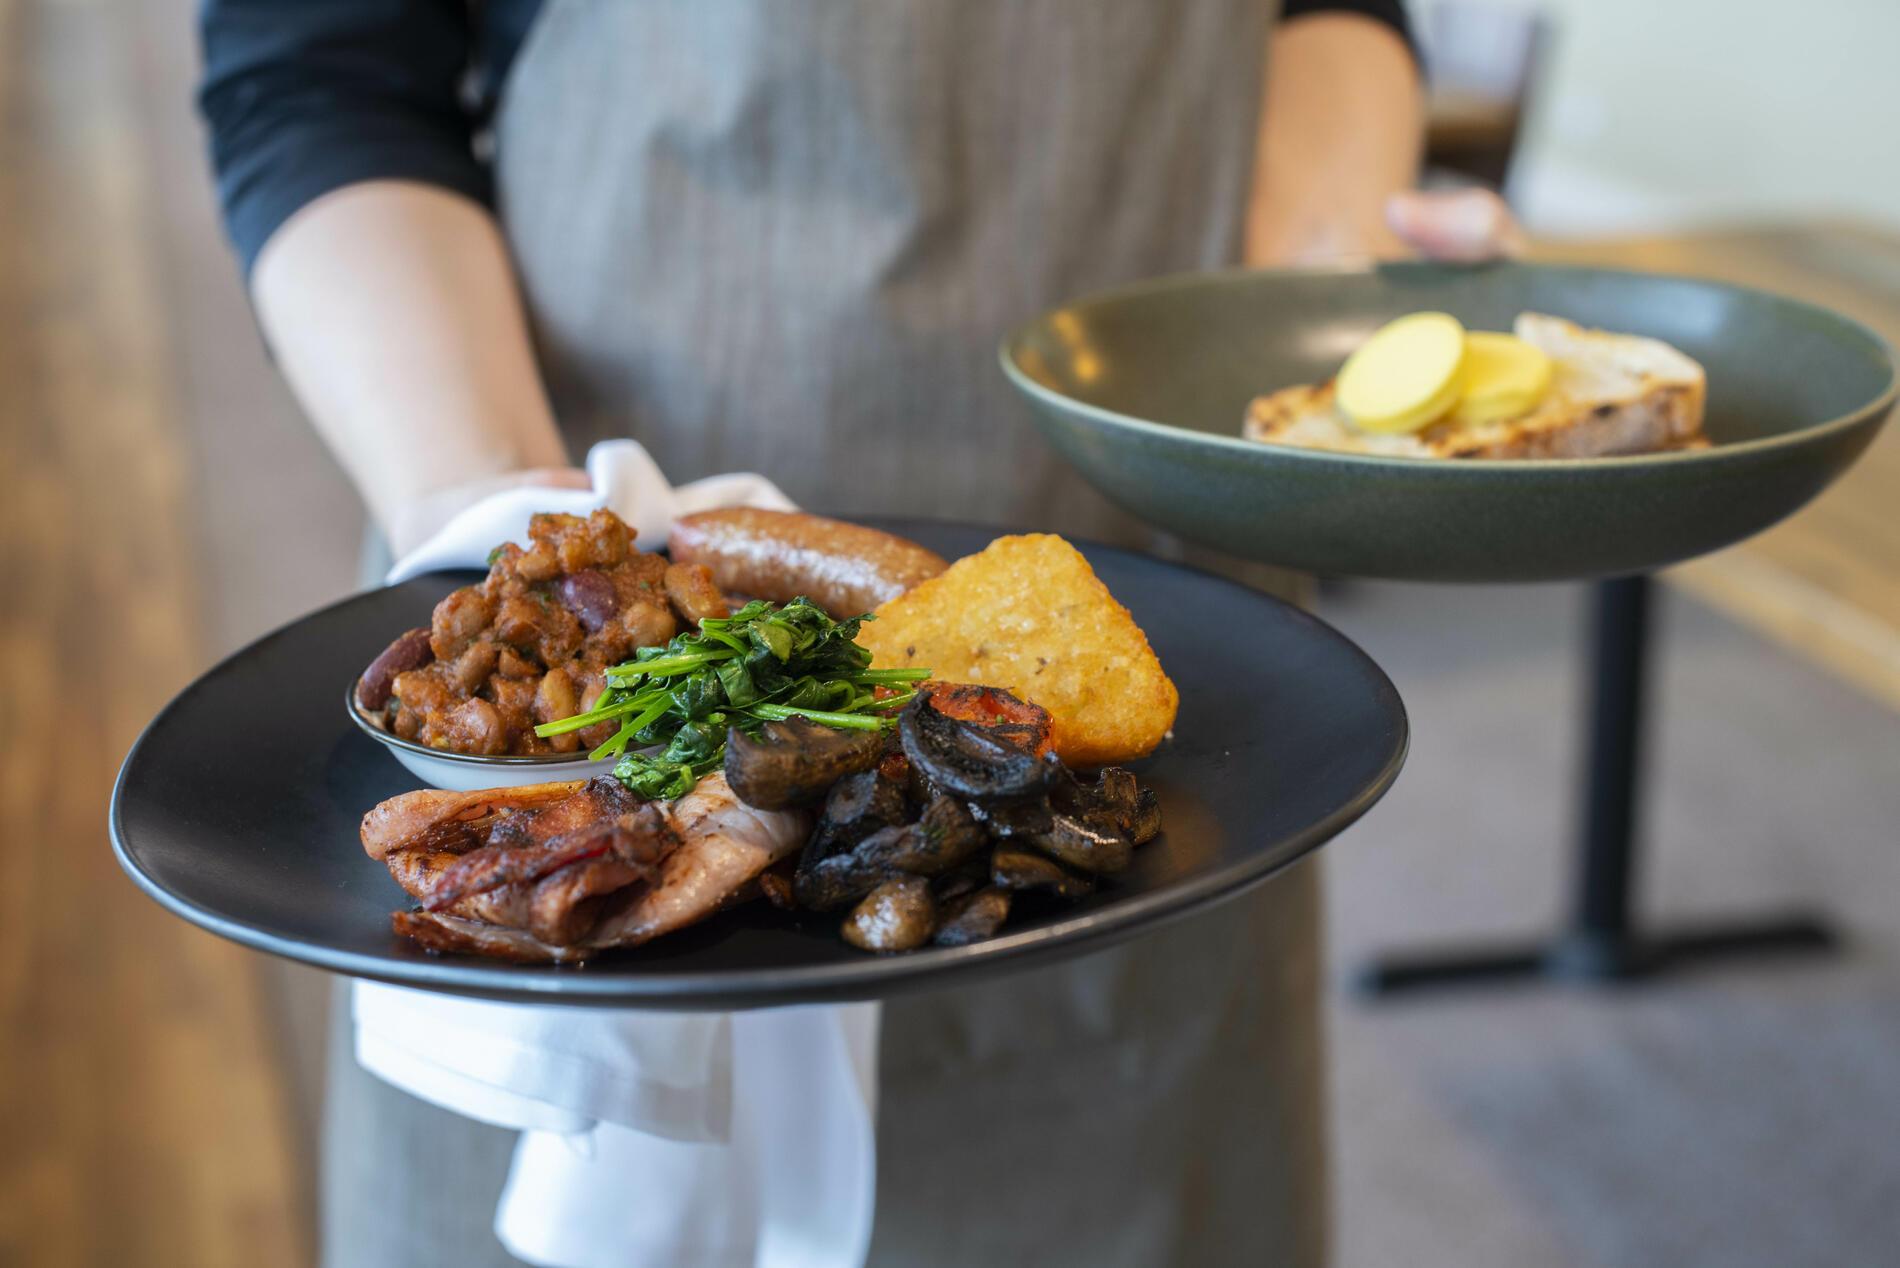 Grilled Breakfast at Bella Restaurant - Yarra Valley Lodge